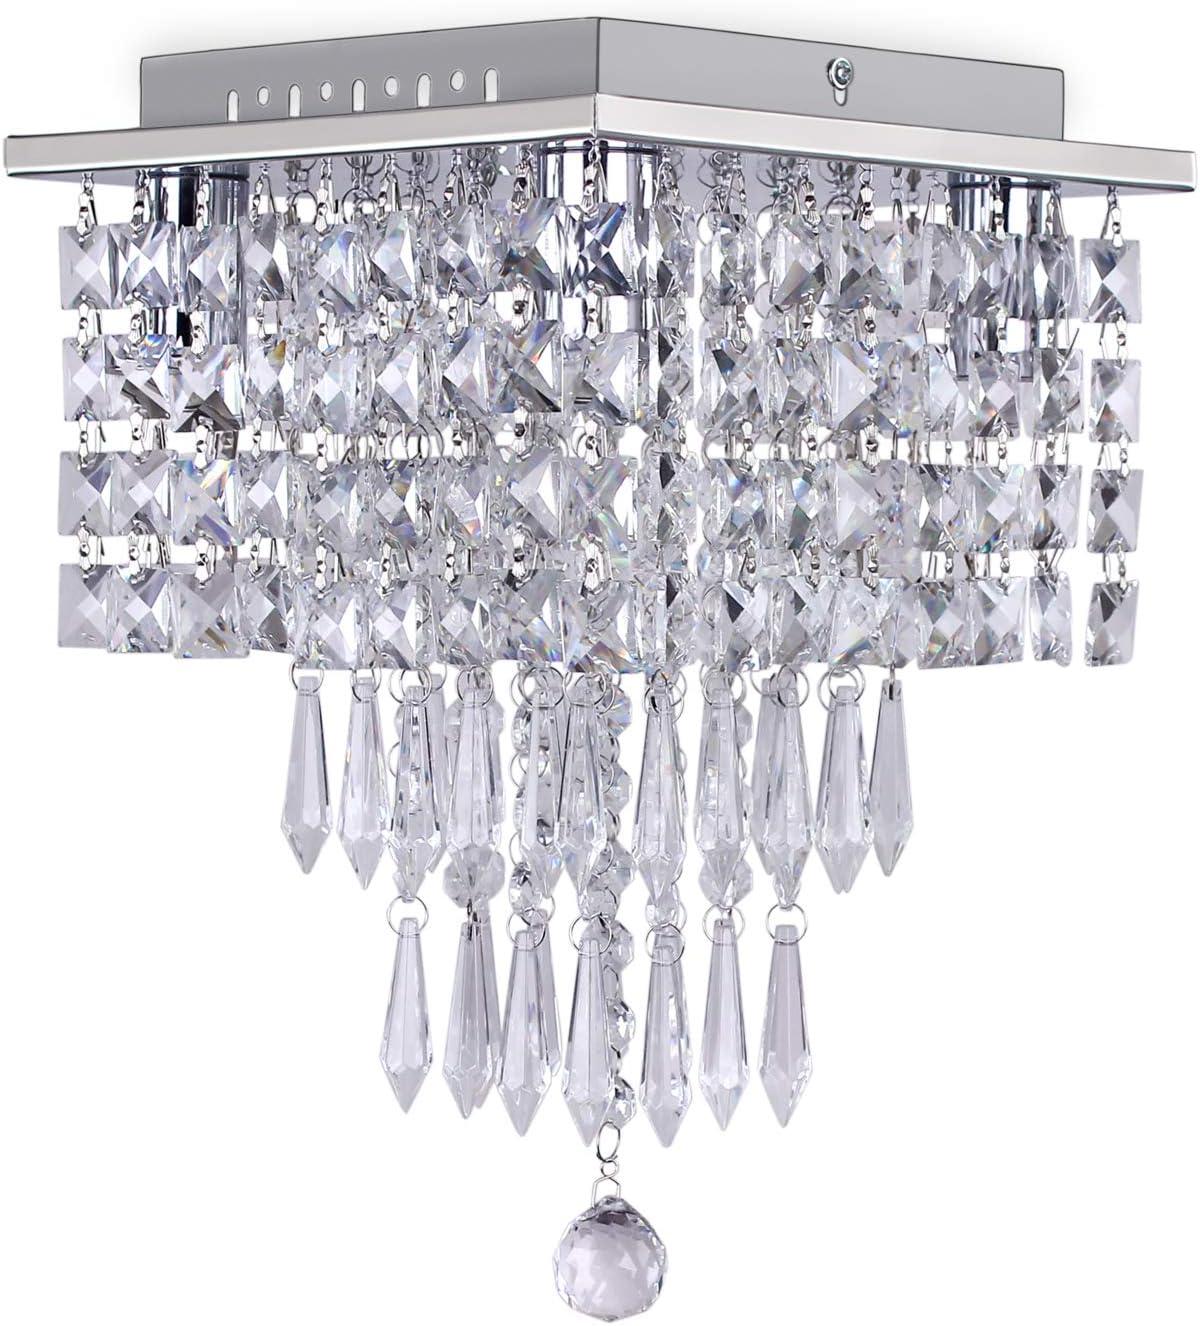 Mini Crystal Chandelier Modern Square Ceiling Lighting Fixture 3 Tiers Raindrop Crystal Flush Mount Pendant Light for Bedroom Living Room Hallway Dining Room,4 Lights,E14 Base